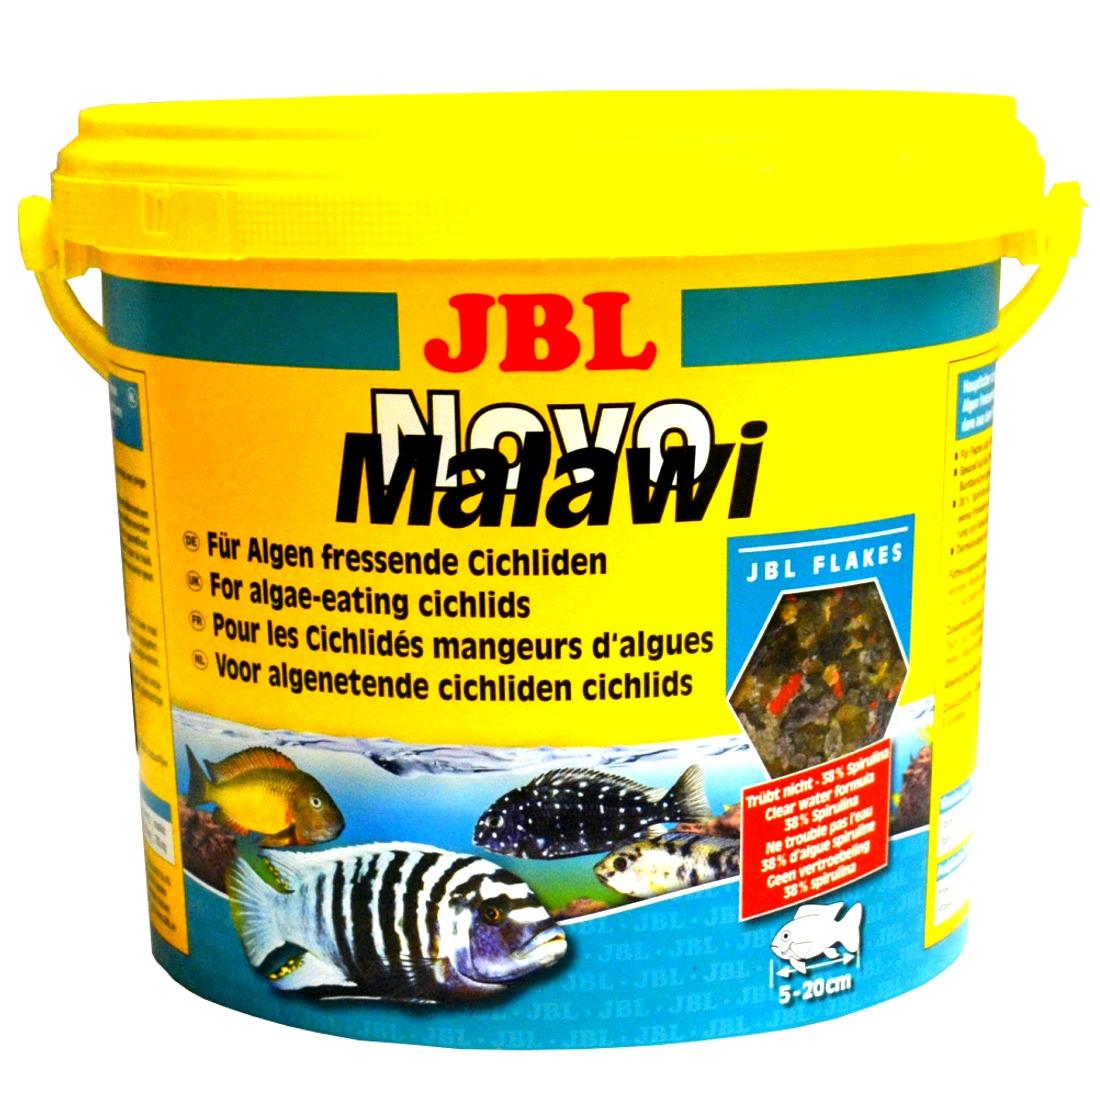 JBL NovoMalawi 5,5 L pour cichlidés rongeurs d\'algues des lacs Malawi / Tanganyika